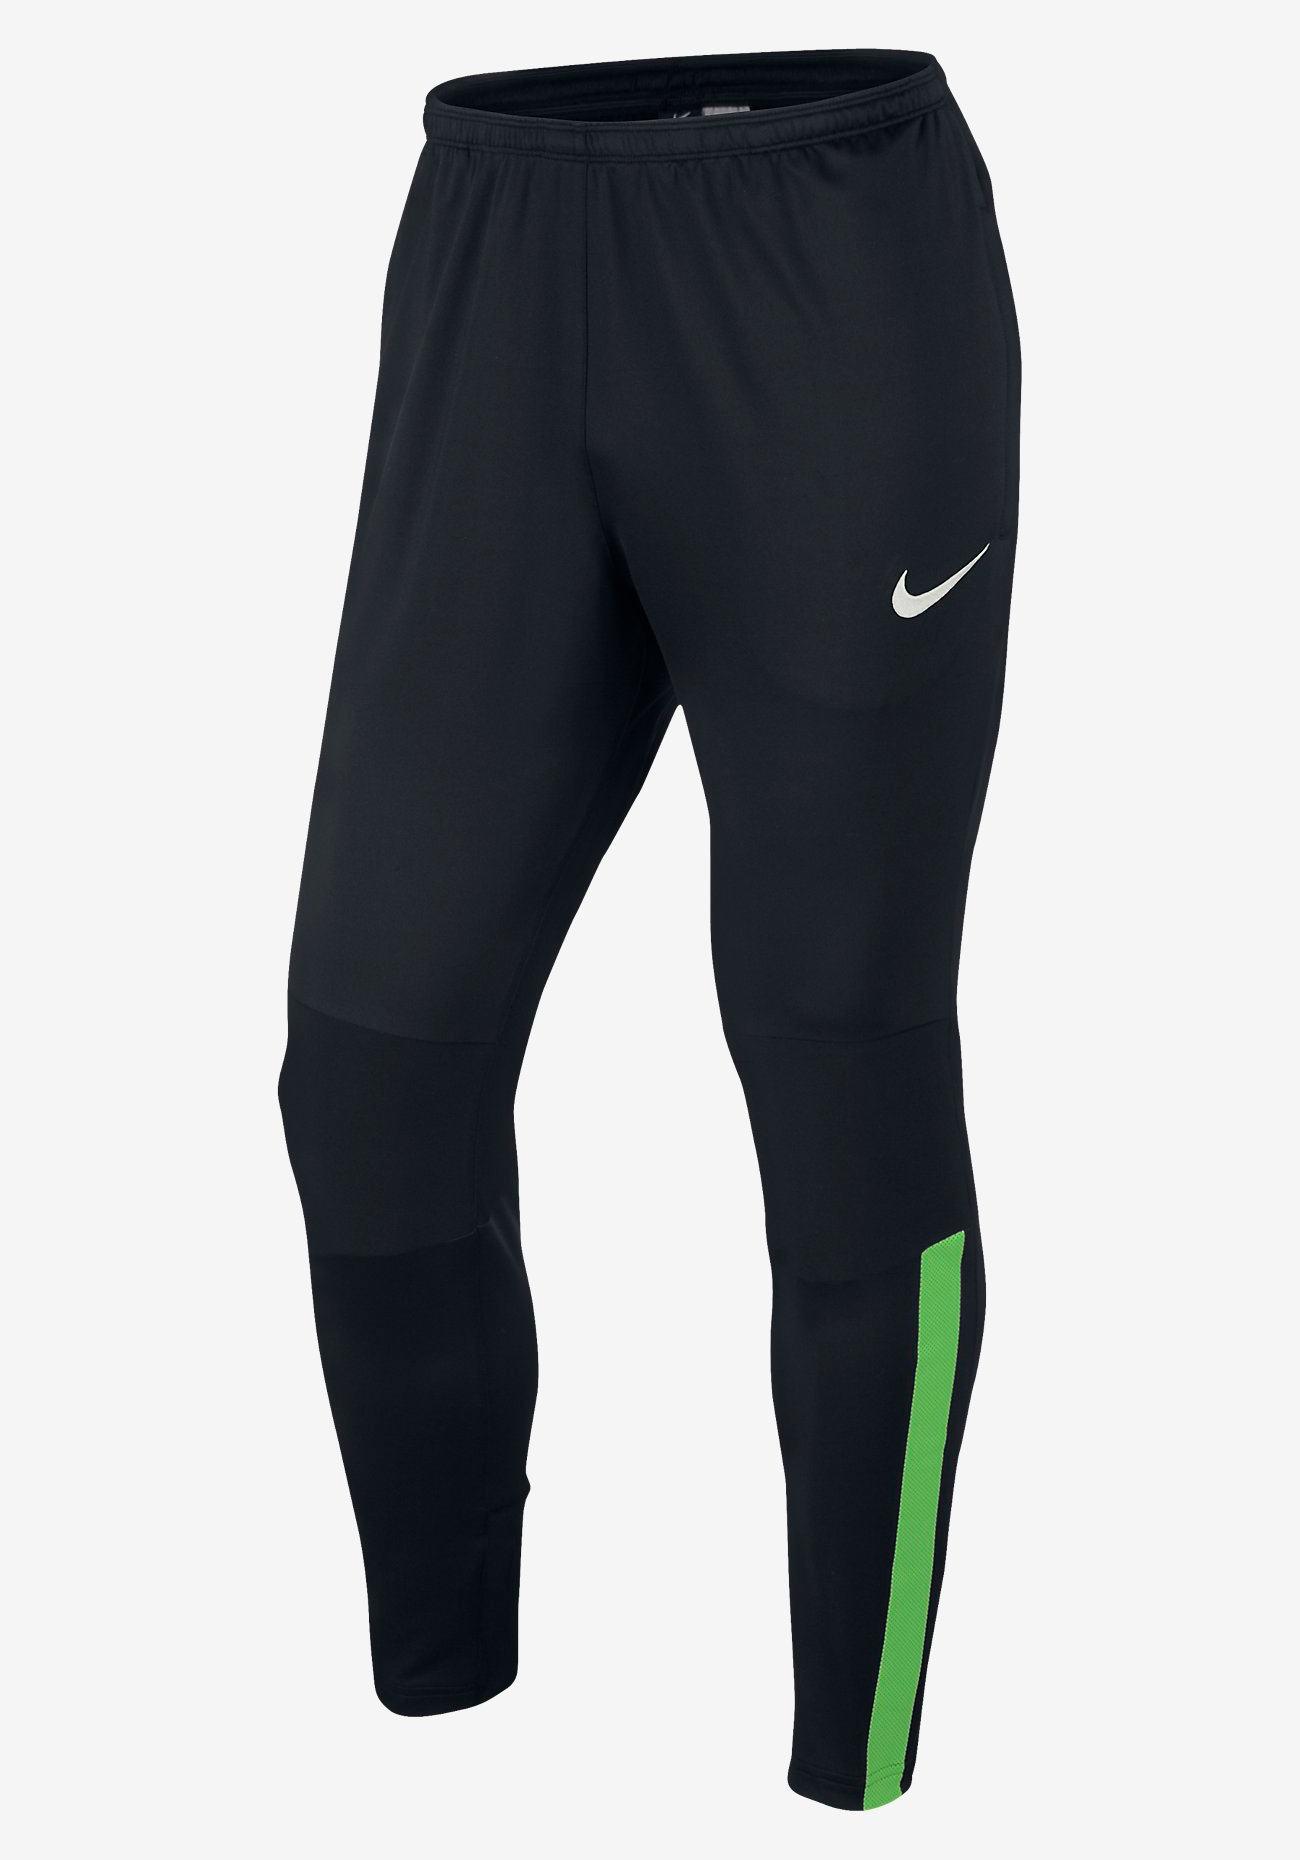 Nike Vo Training Shoes